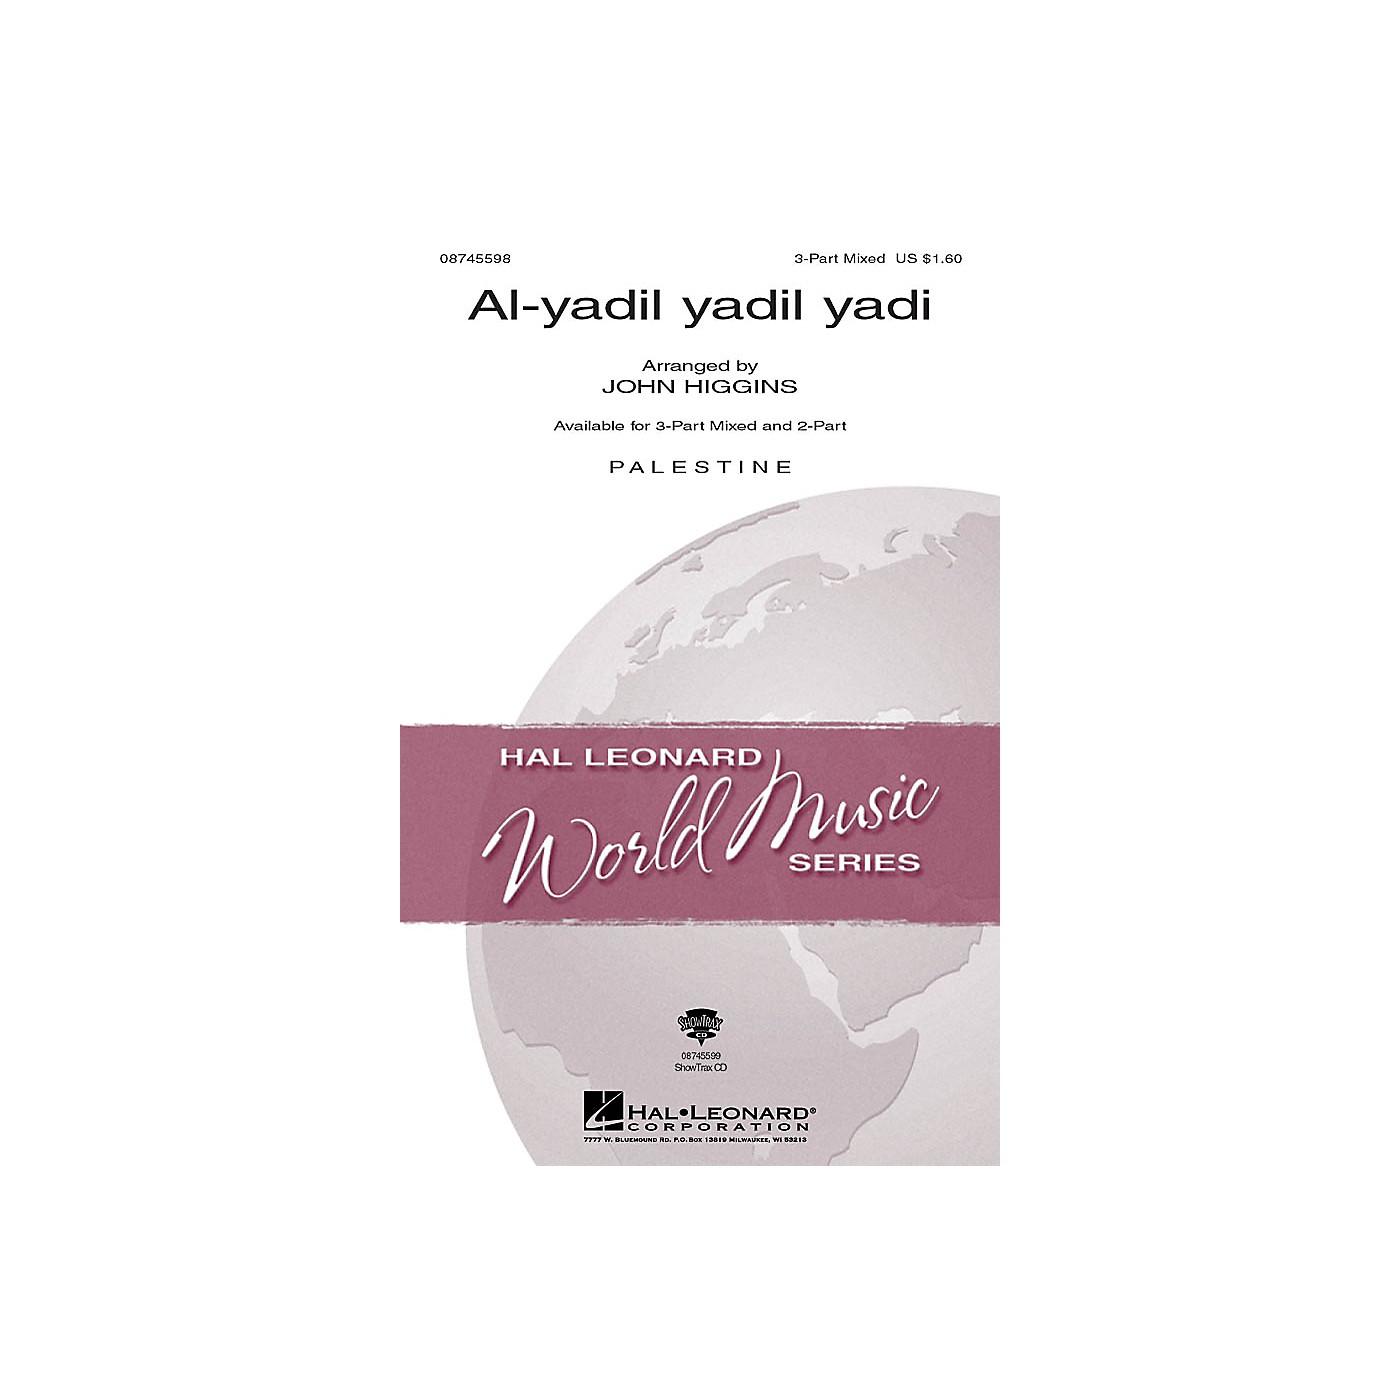 Hal Leonard Al-yadil yadil yadi 3-Part Mixed arranged by John Higgins thumbnail